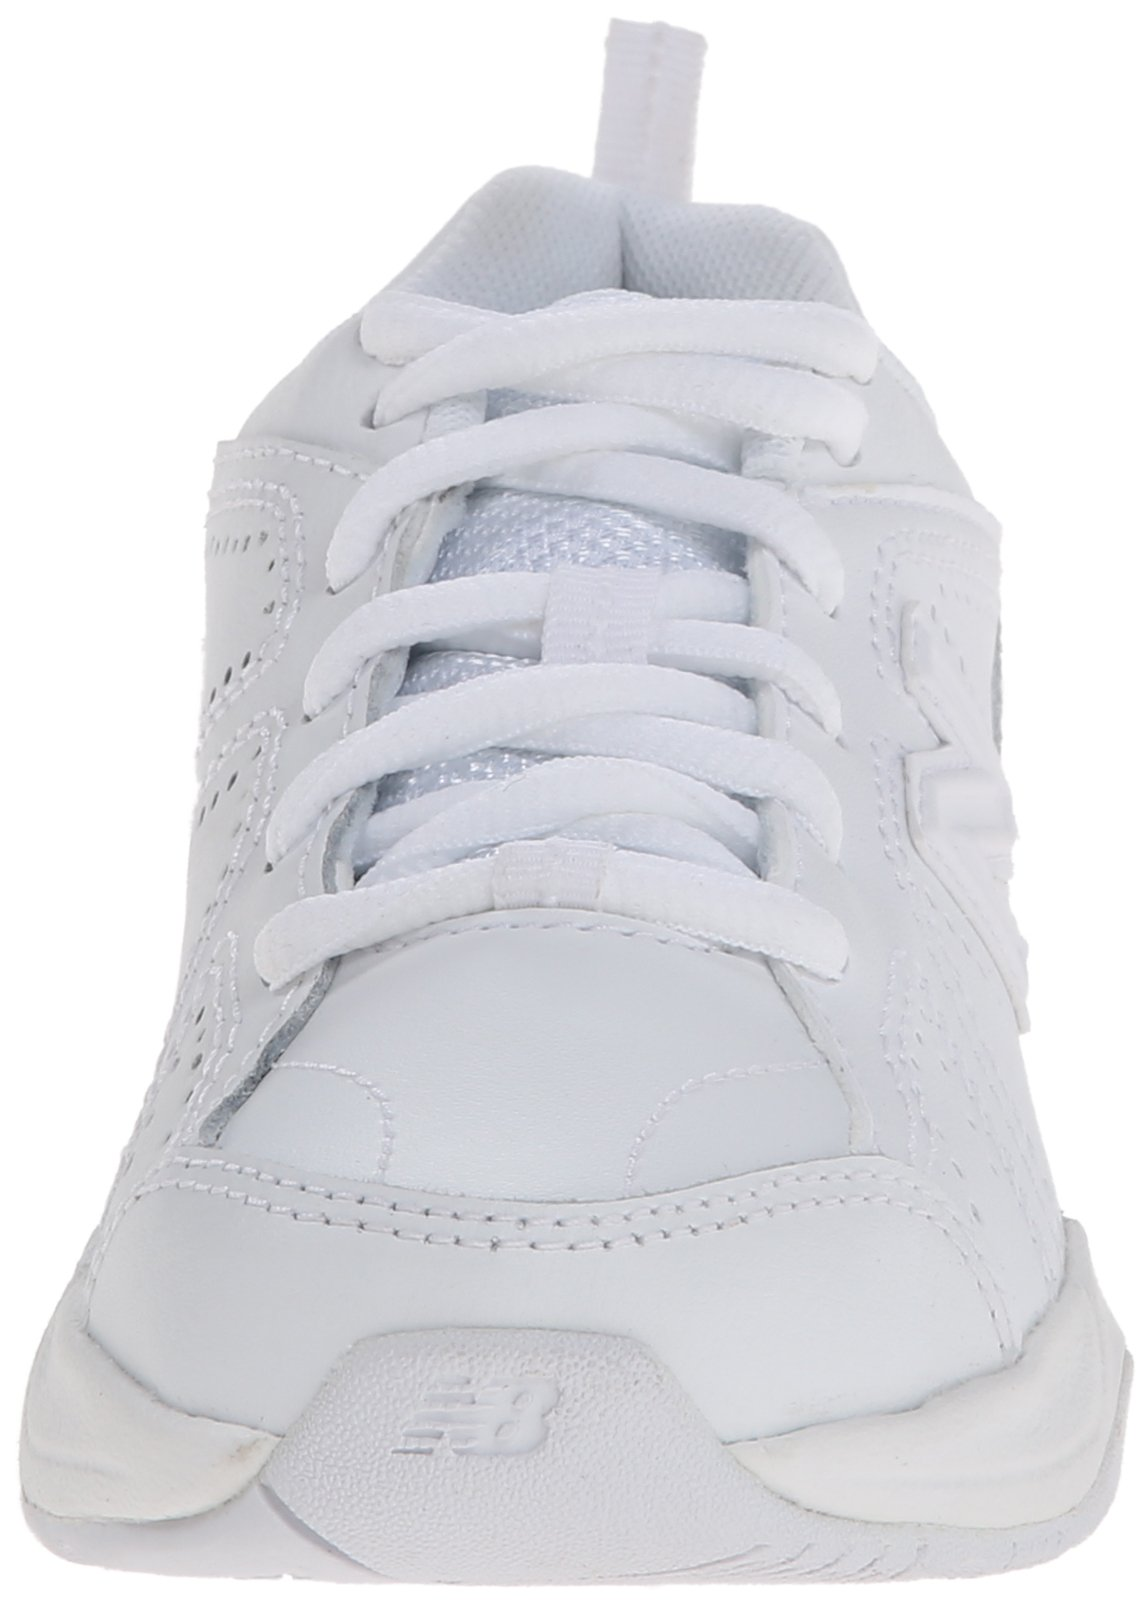 New Balance Boys KX624 Lace-Up Training Shoe ,White,13.5 M US Little Kid by New Balance (Image #4)